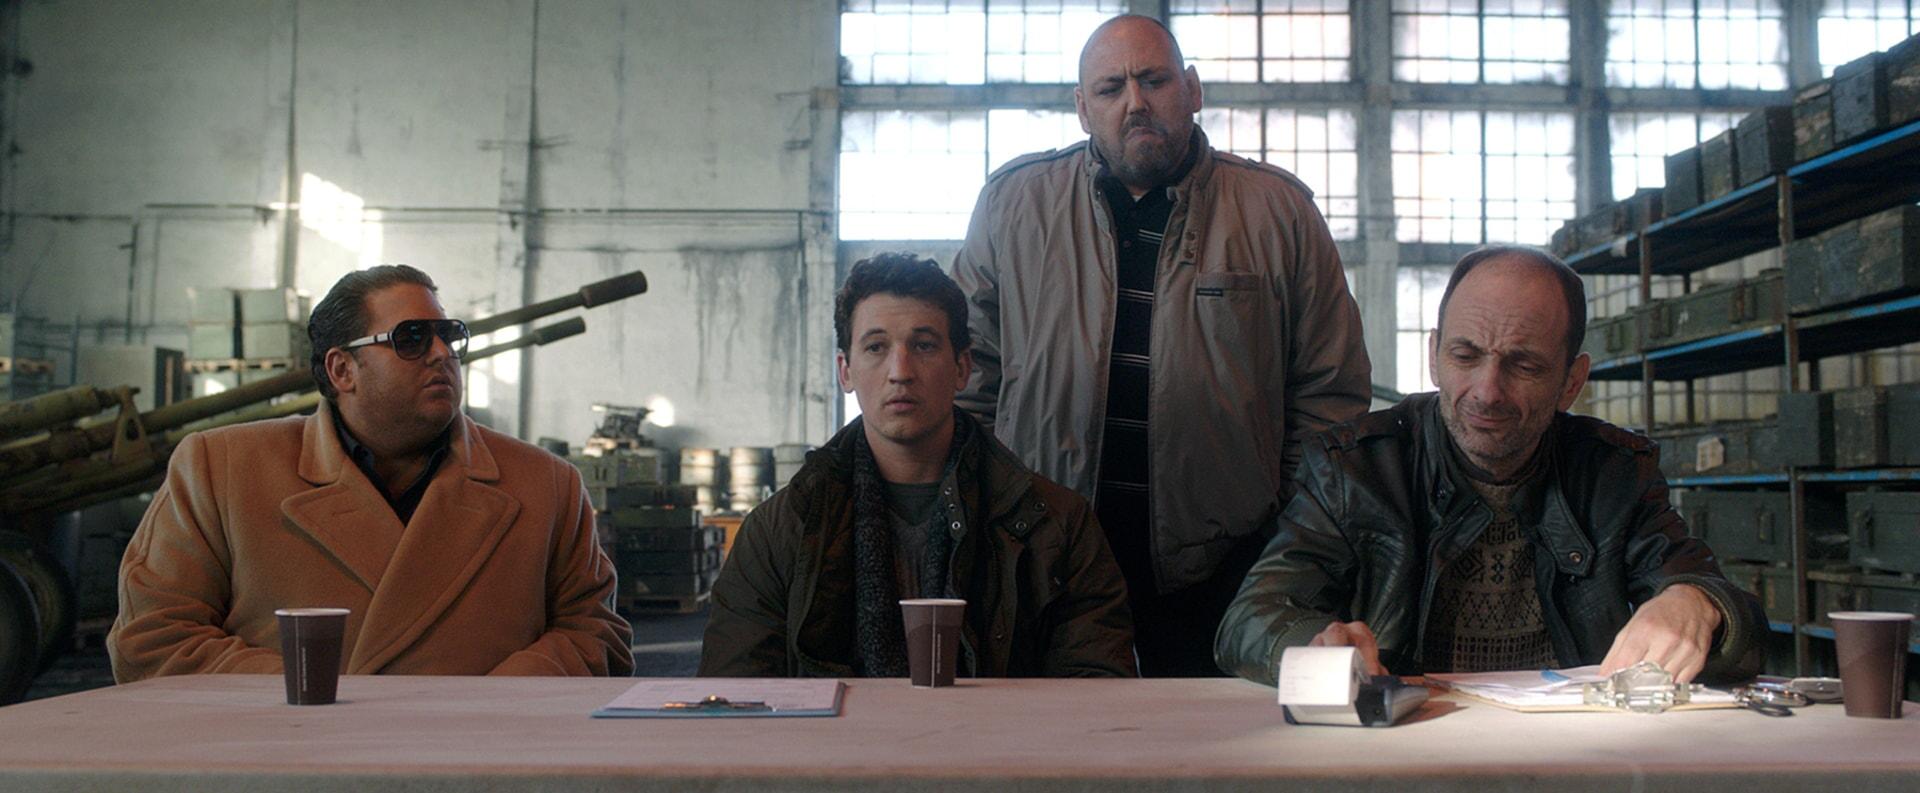 "JONAH HILL as Efraim, MILES TELLER as David, JB BLANC as Bashkim and GABRIEL SPAHIU as Enver in Warner Bros. Pictures' comedic drama (based on true events) ""WAR DOGS,"" a Warner Bros. Pictures release."